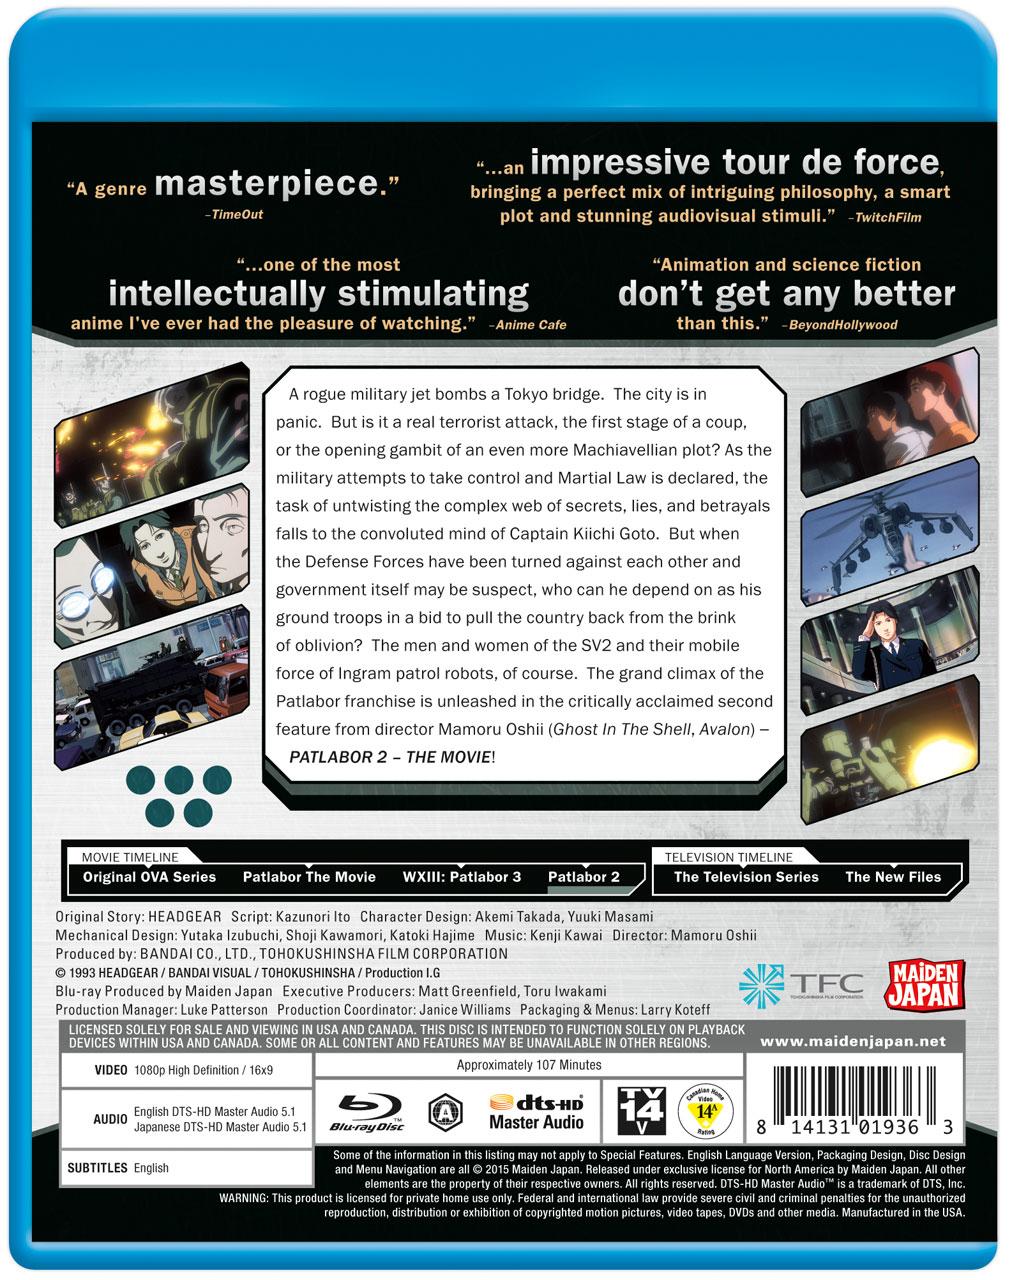 Patlabor 2 the Movie Blu-ray